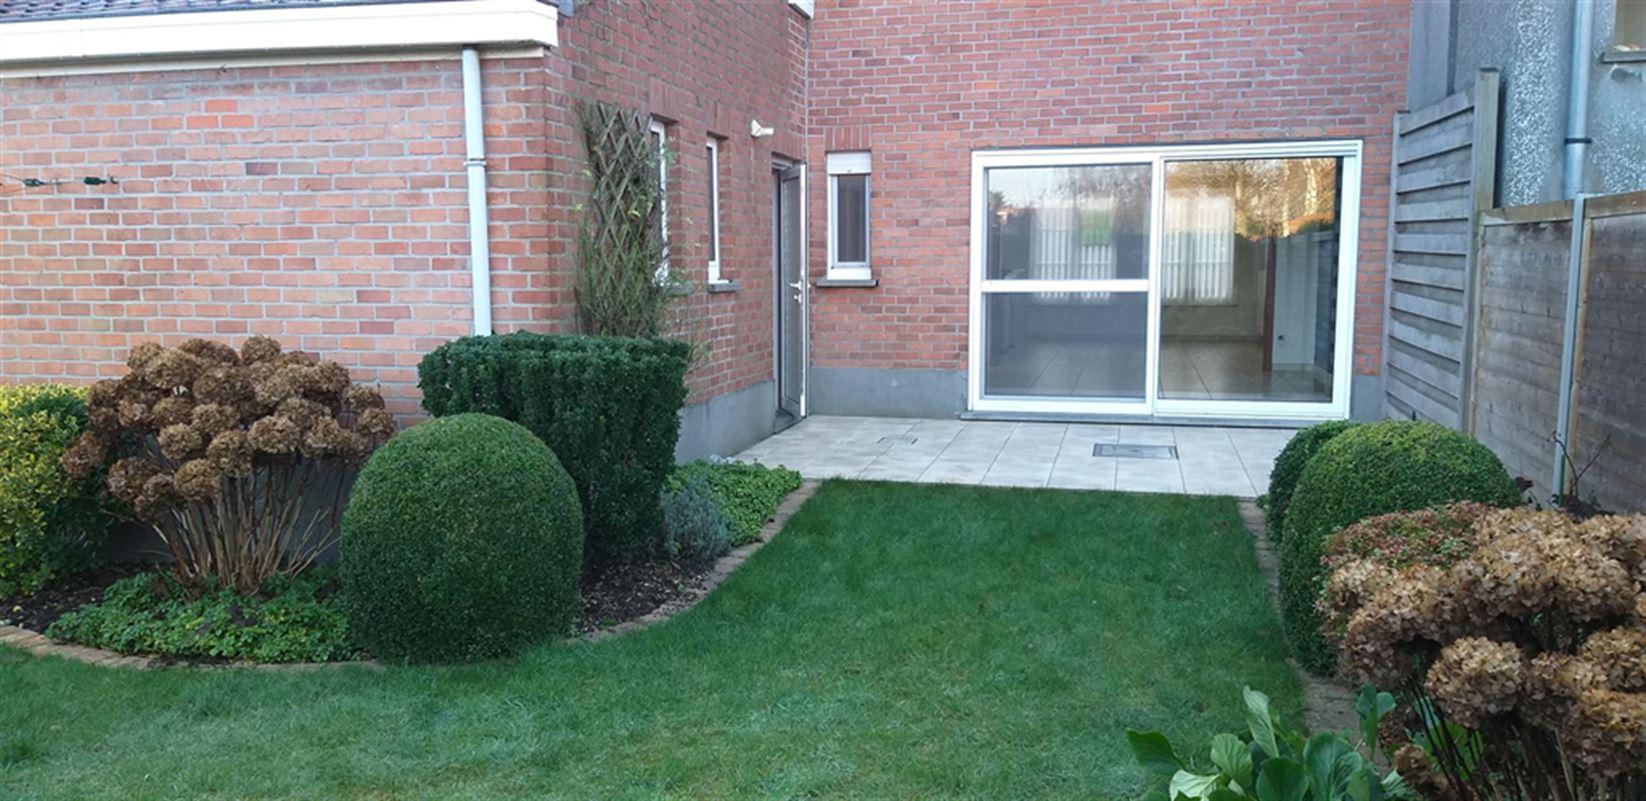 Foto 2 : Huis te 8500 KORTRIJK (België) - Prijs € 795